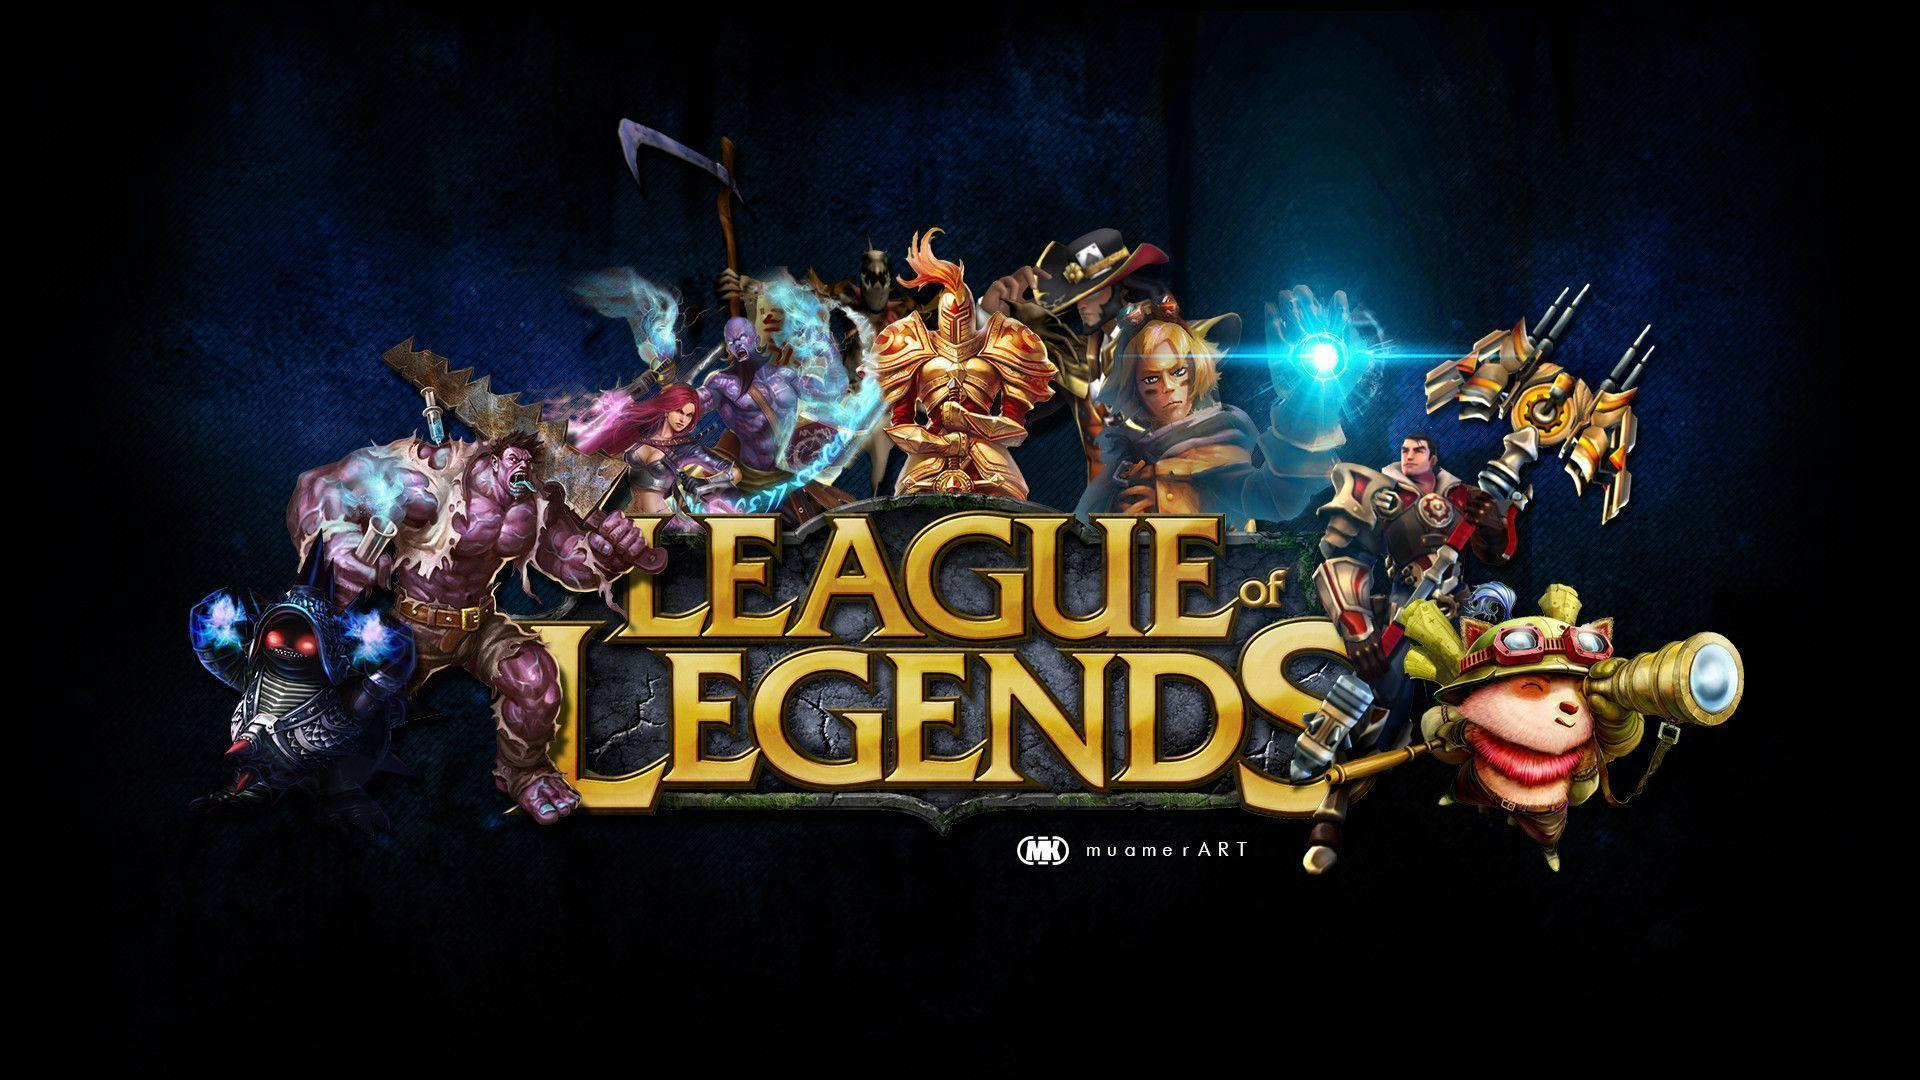 League Of Legends Wallpapers Wallpaper Cave